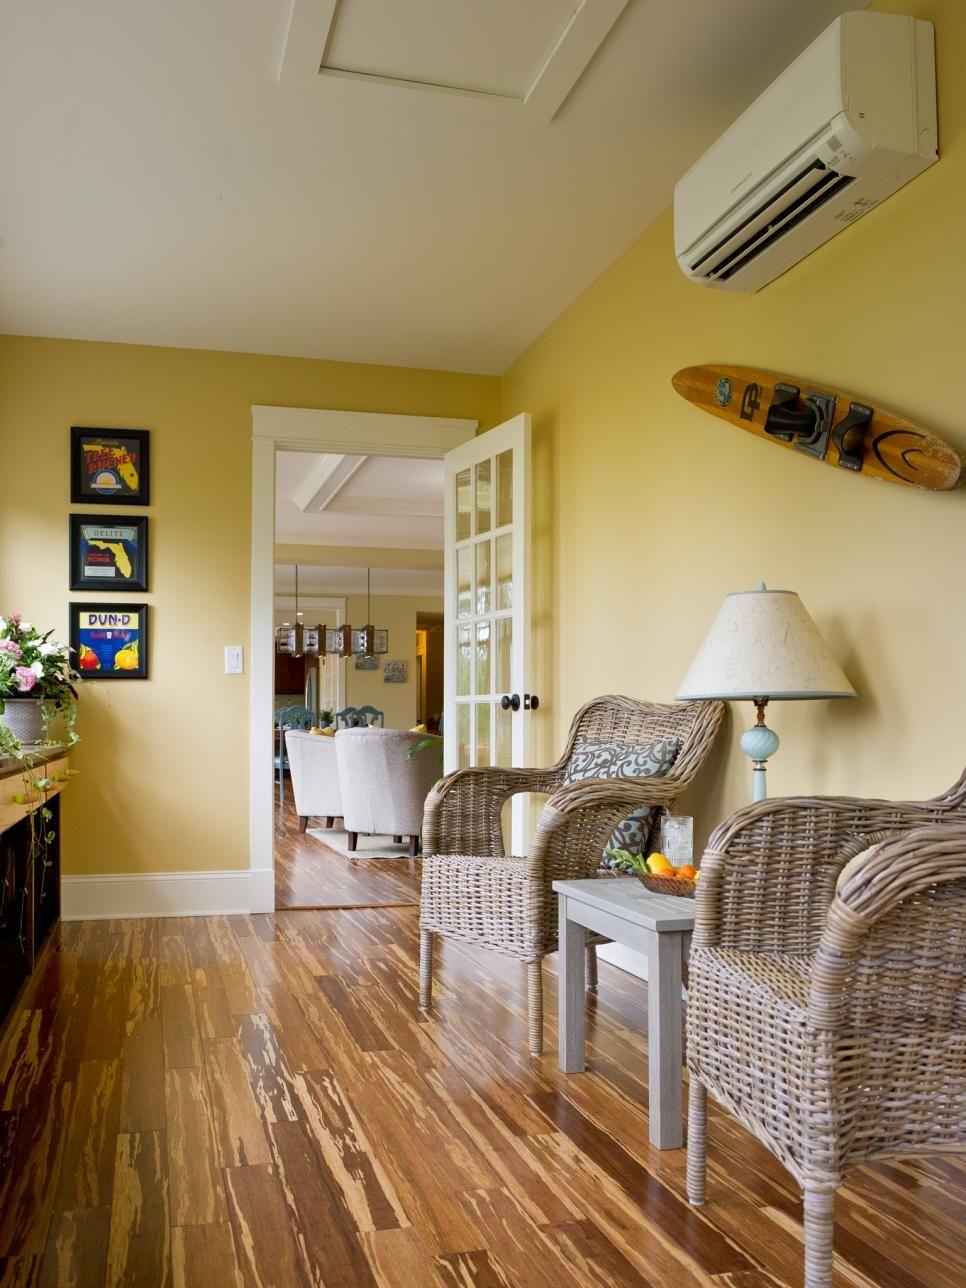 Sunroom Pictures From Blog Cabin 2014 | Bonus room design ...